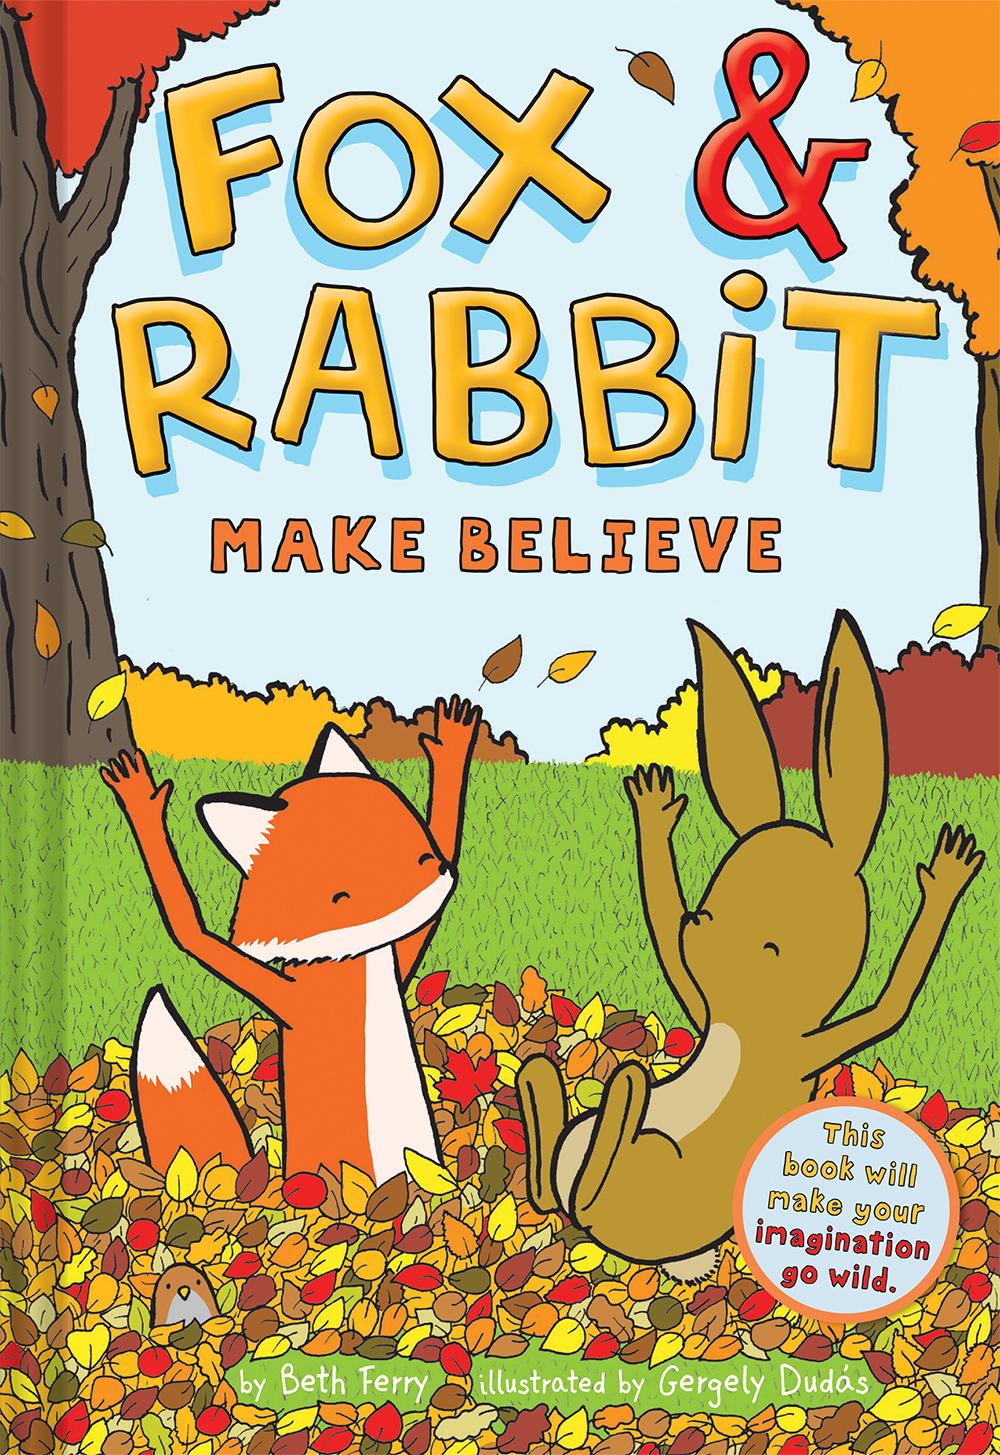 Fox & Rabbit Make Believe by Beth Ferry